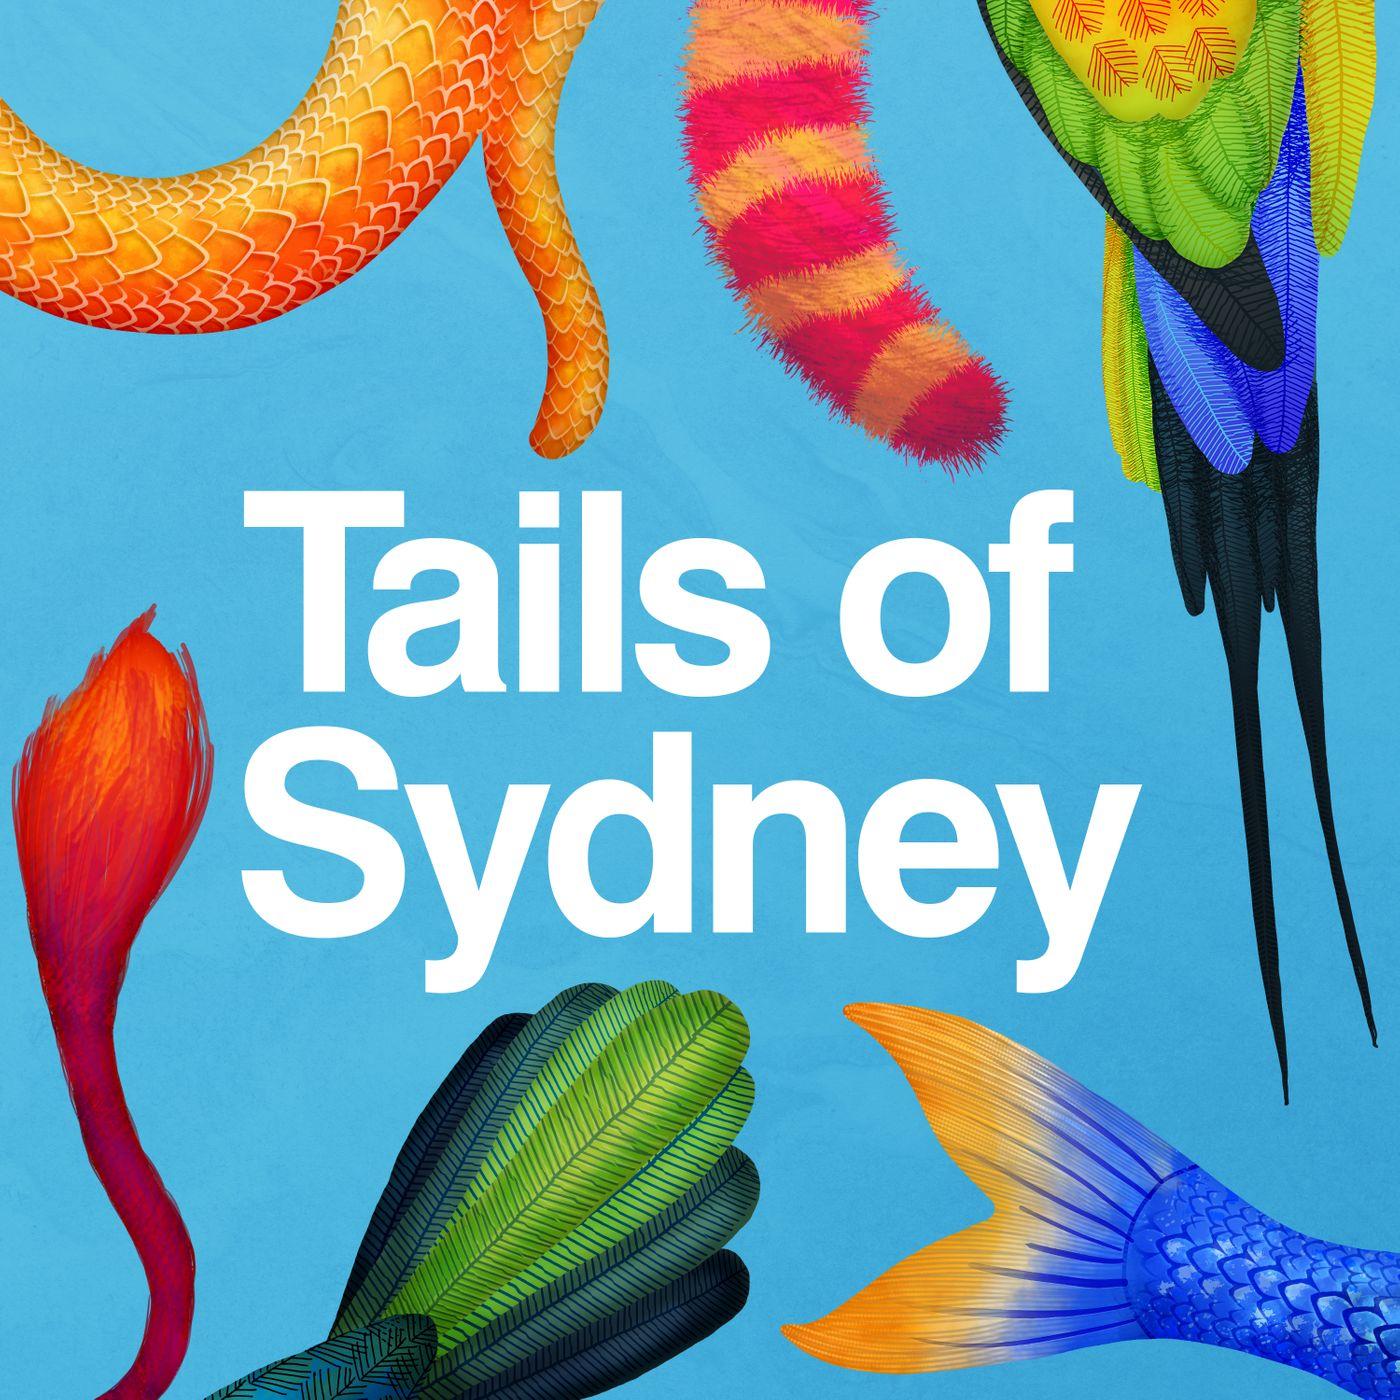 Tails of Sydney